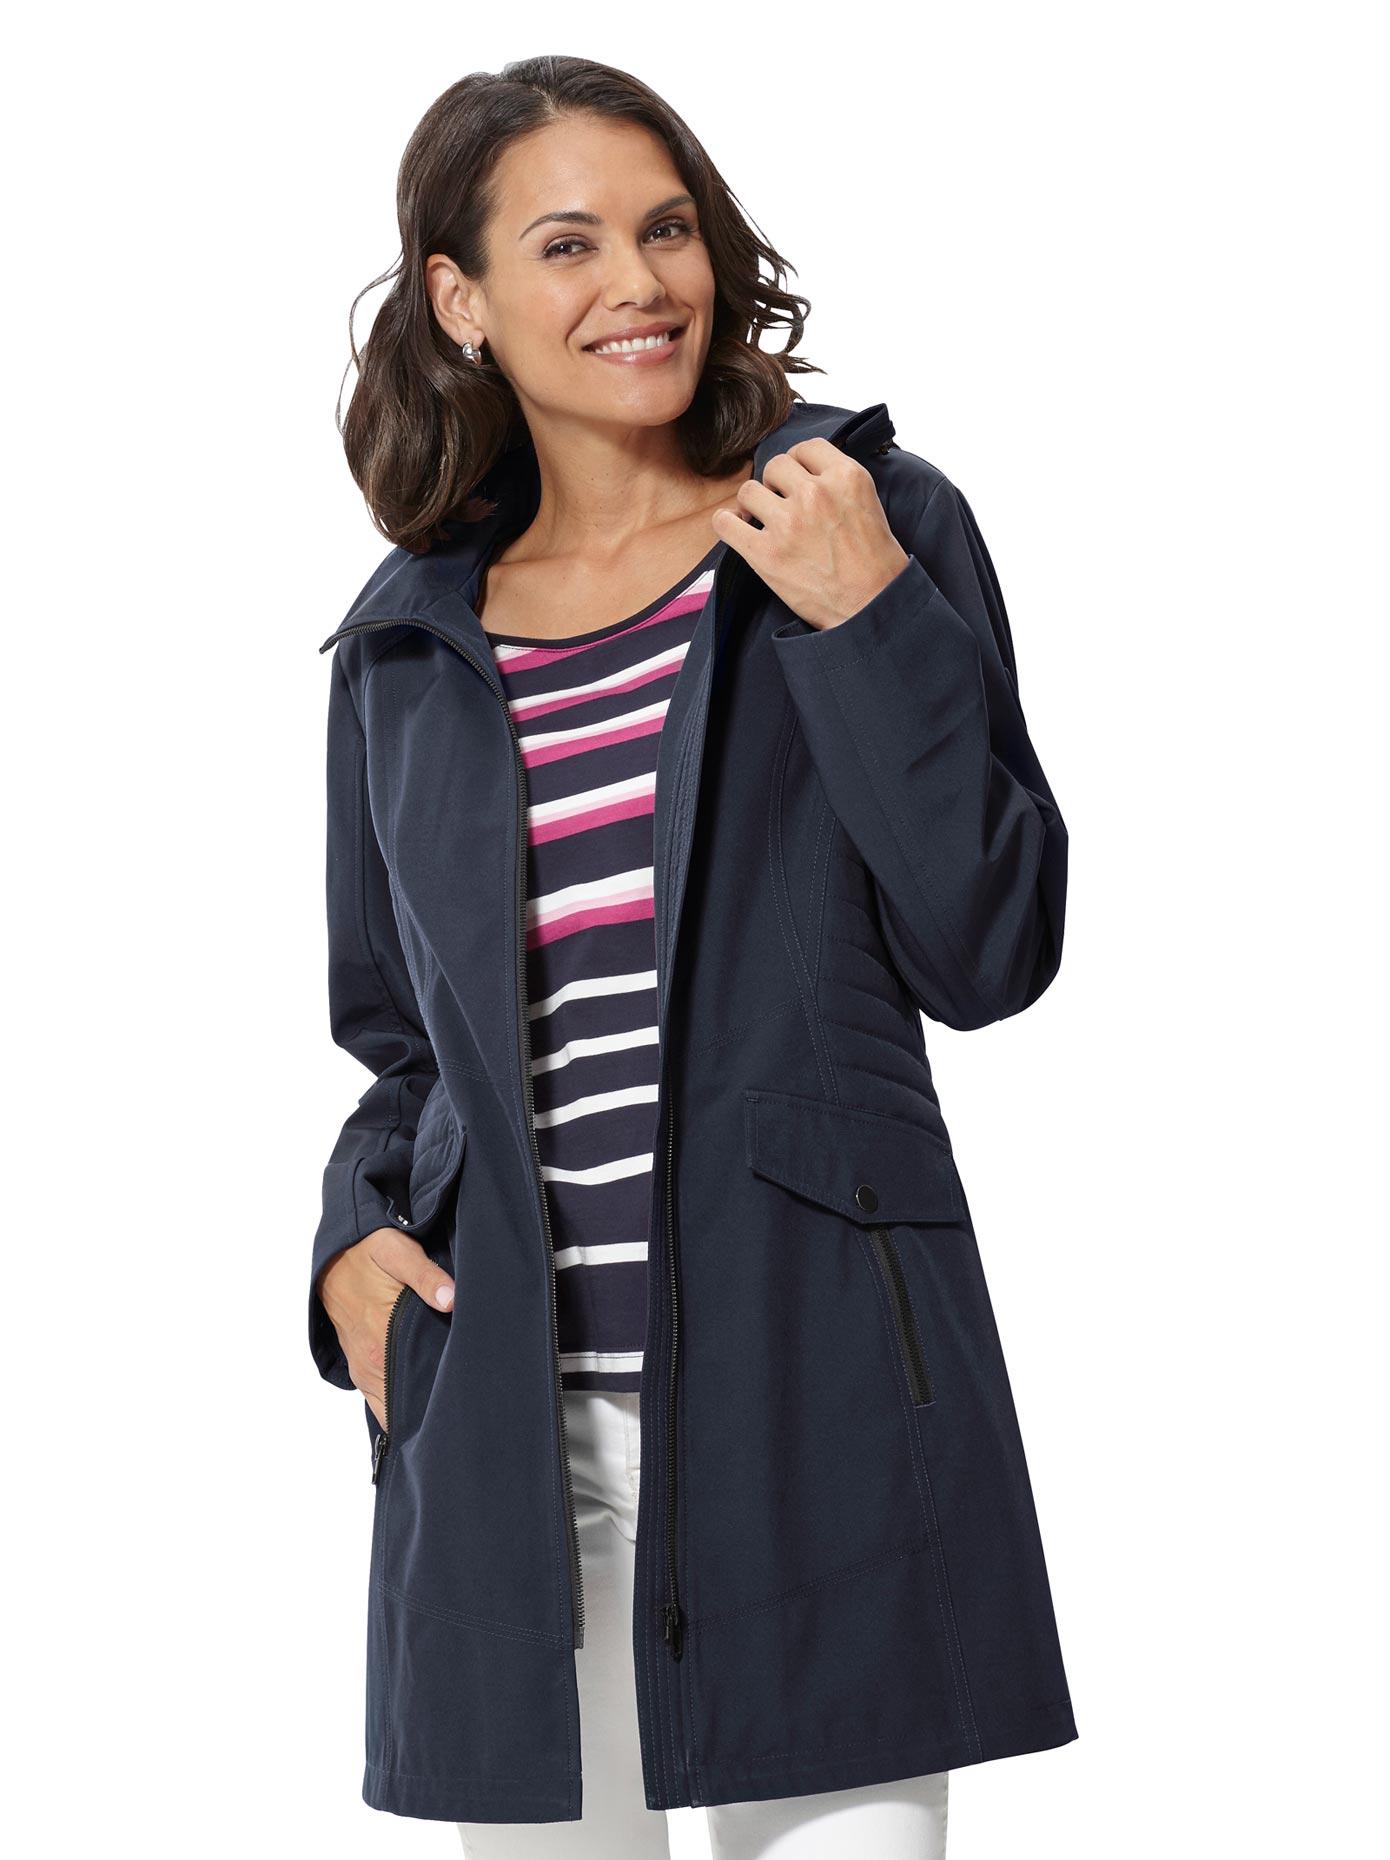 Casual Looks Softshelljacke mit figurformenden Nähte | Bekleidung > Jacken > Softshelljacken | Blau | Casual Looks